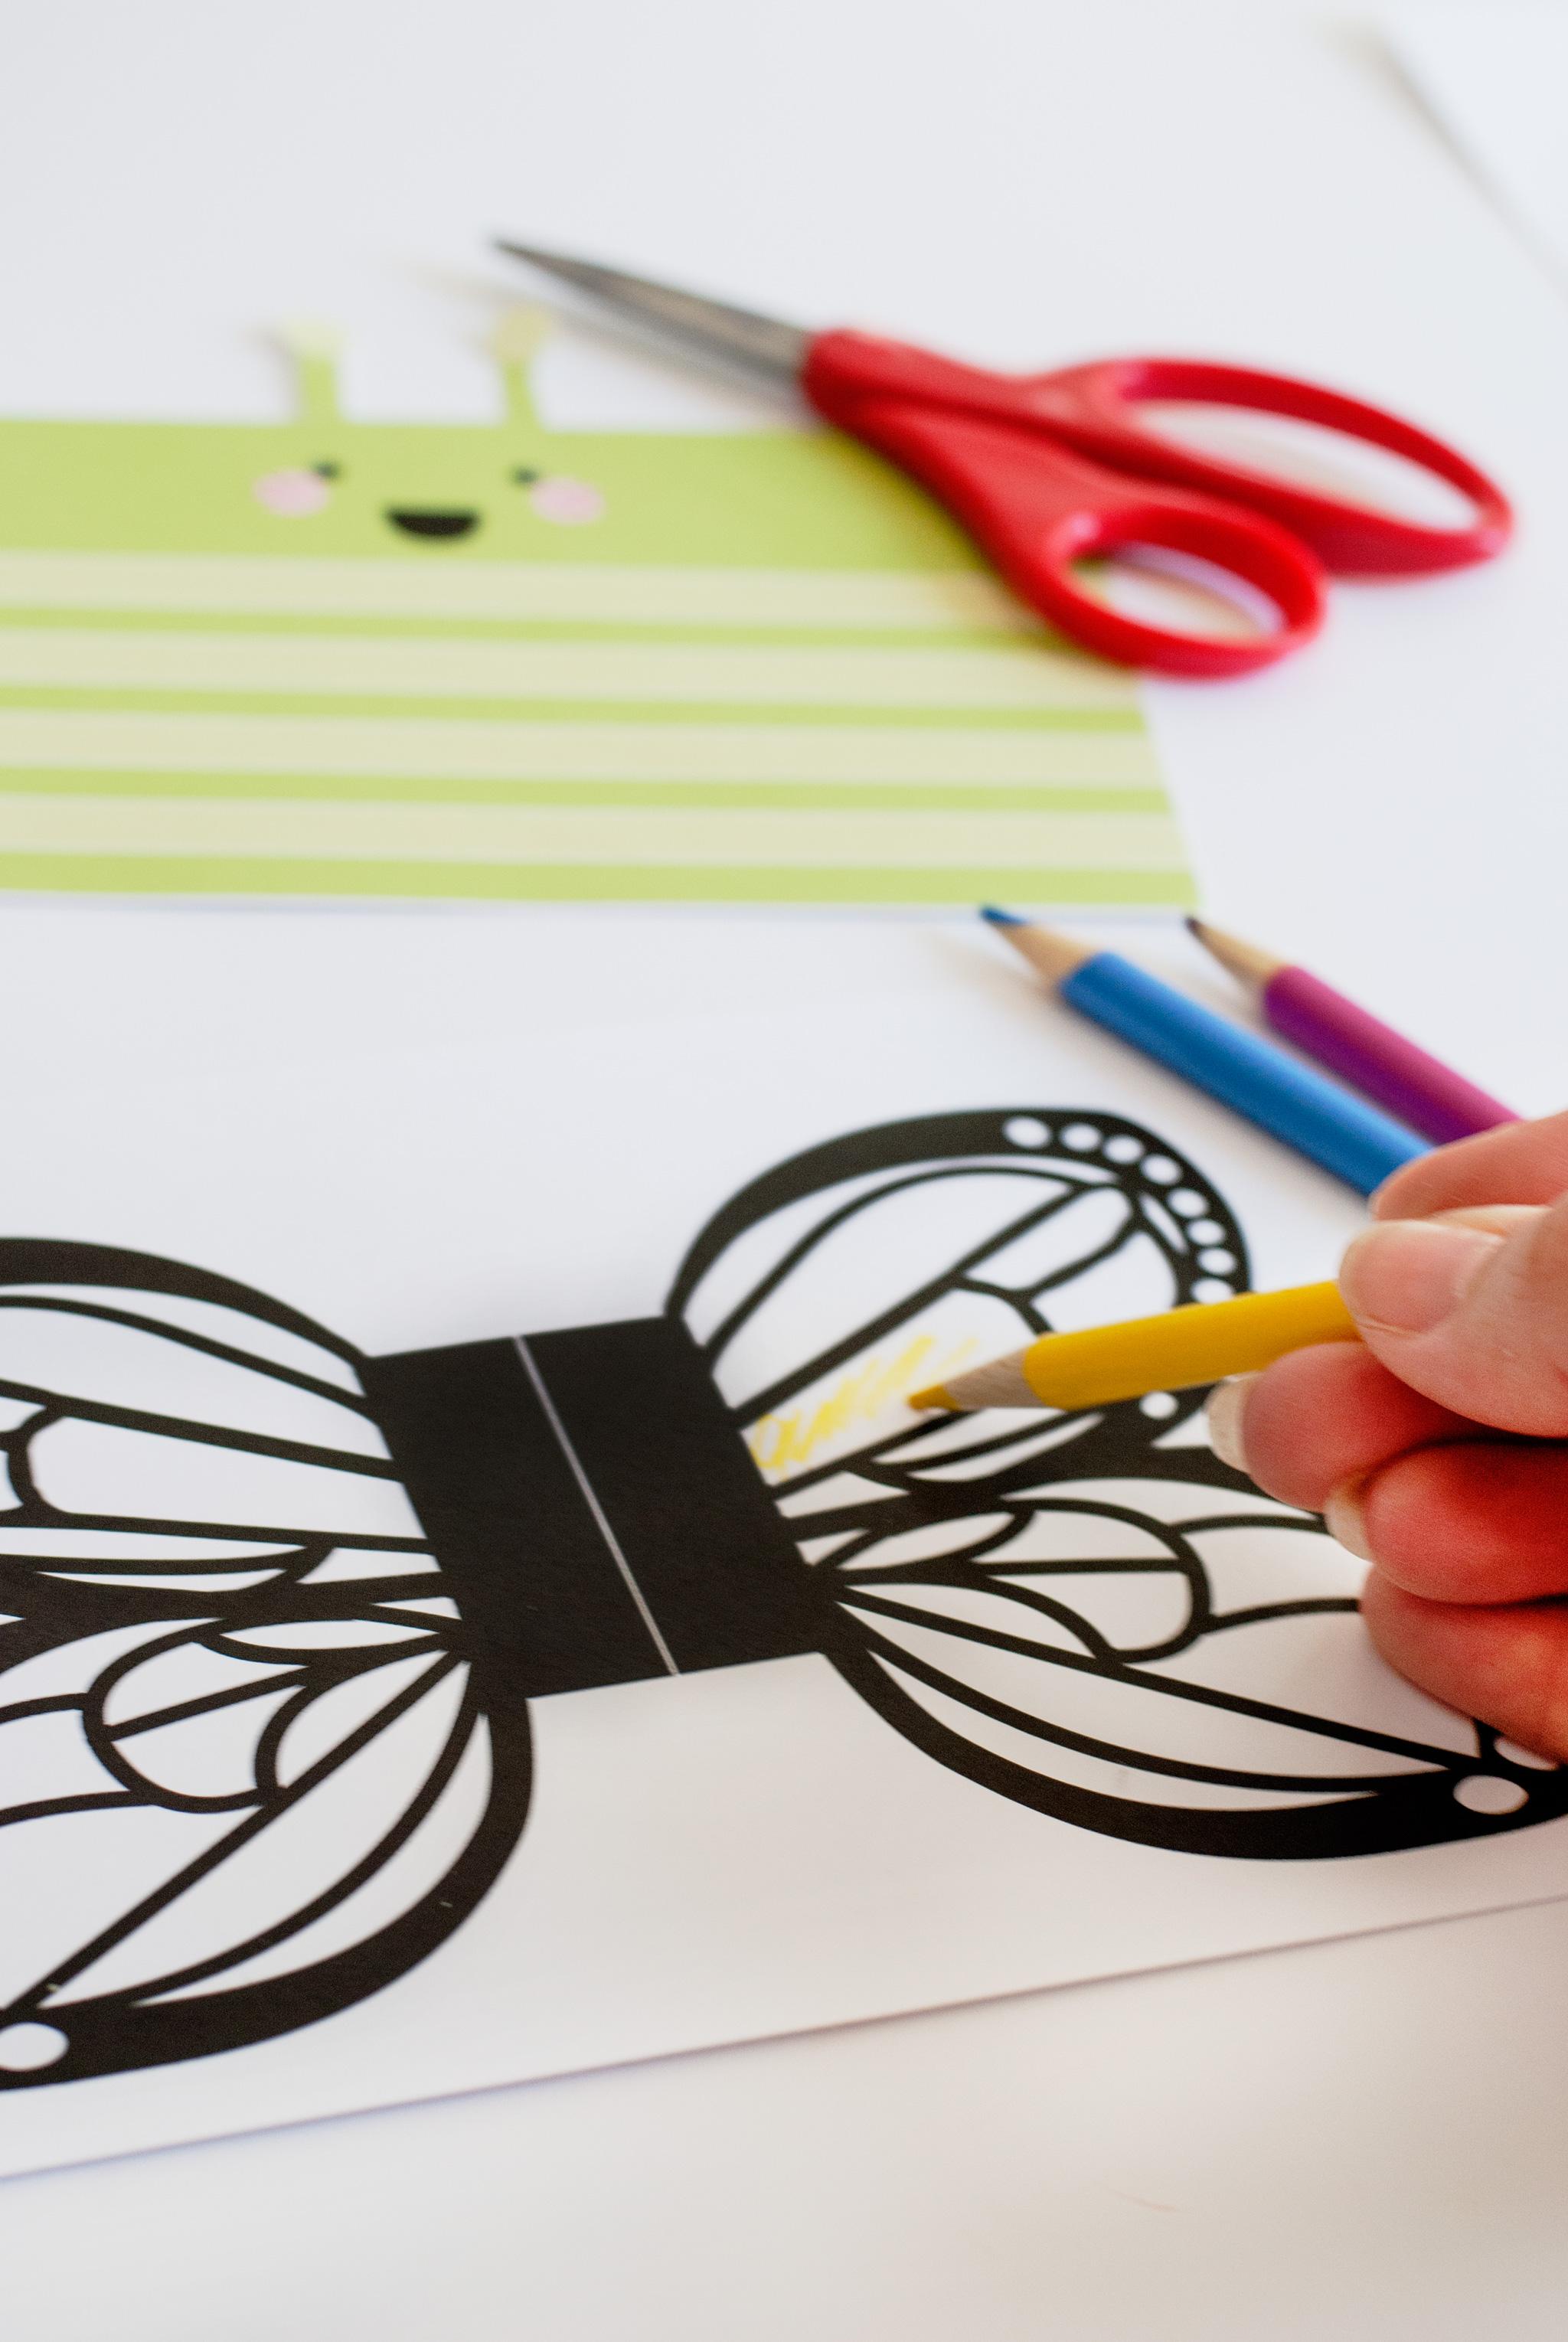 DIY Butterfly Kids Craft